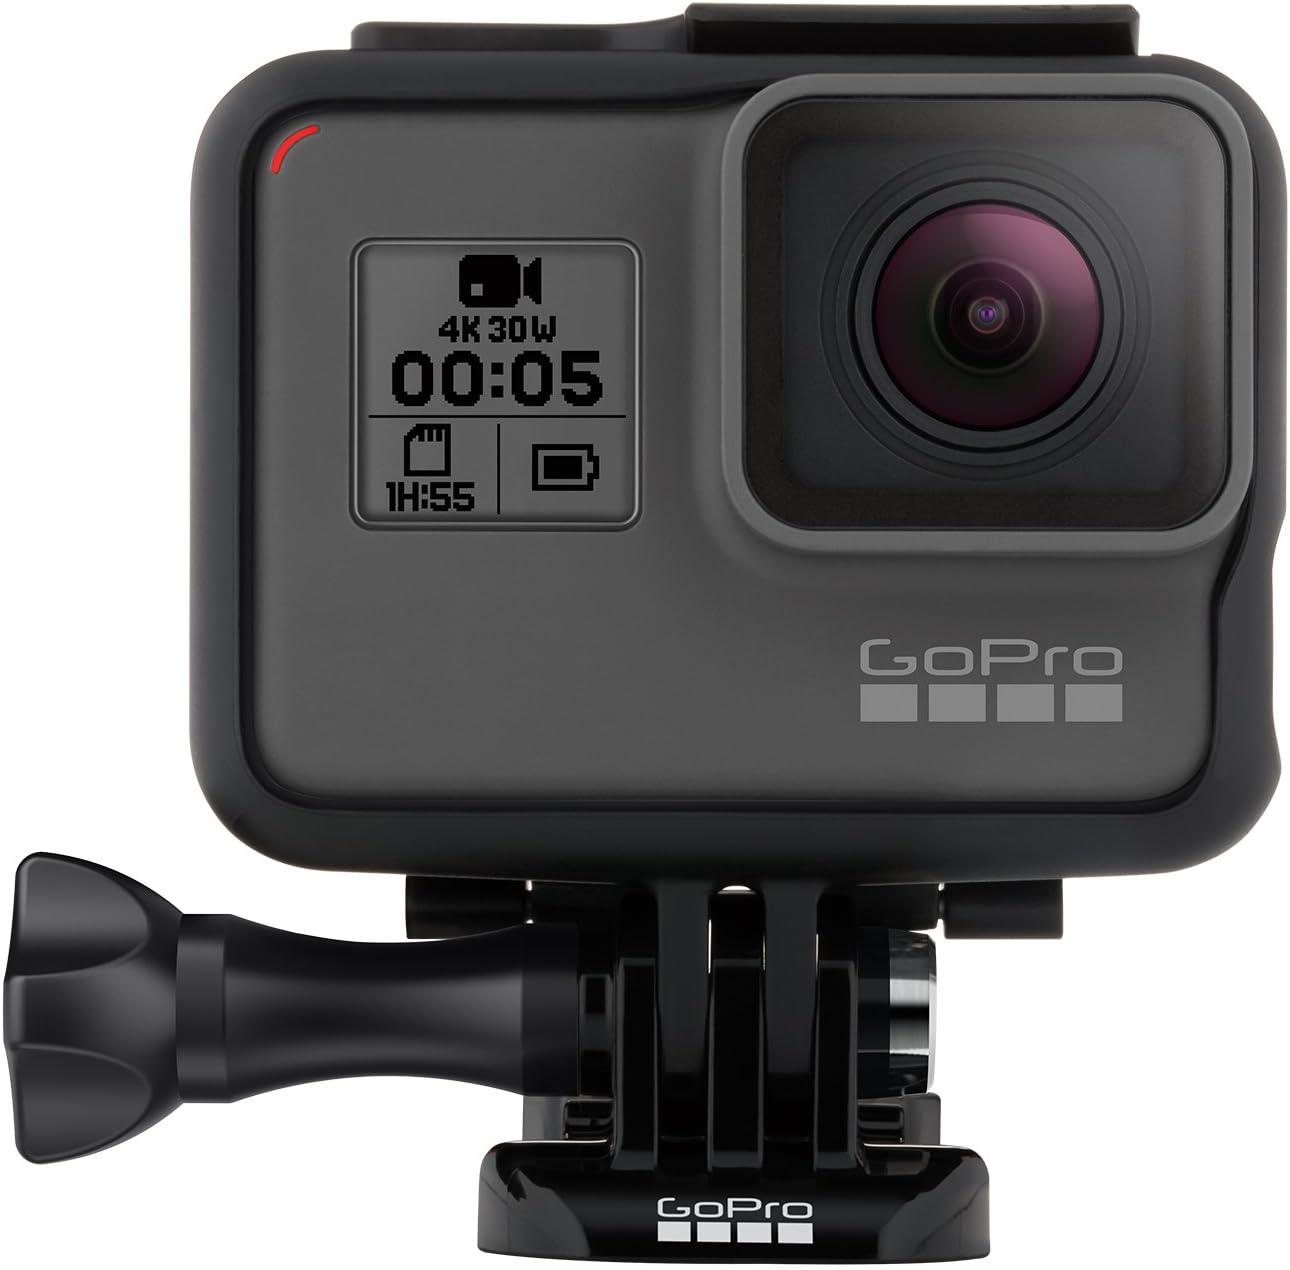 Gopro Chdhx 501 Hero5 Black Action Kamera Schwarz Kamera